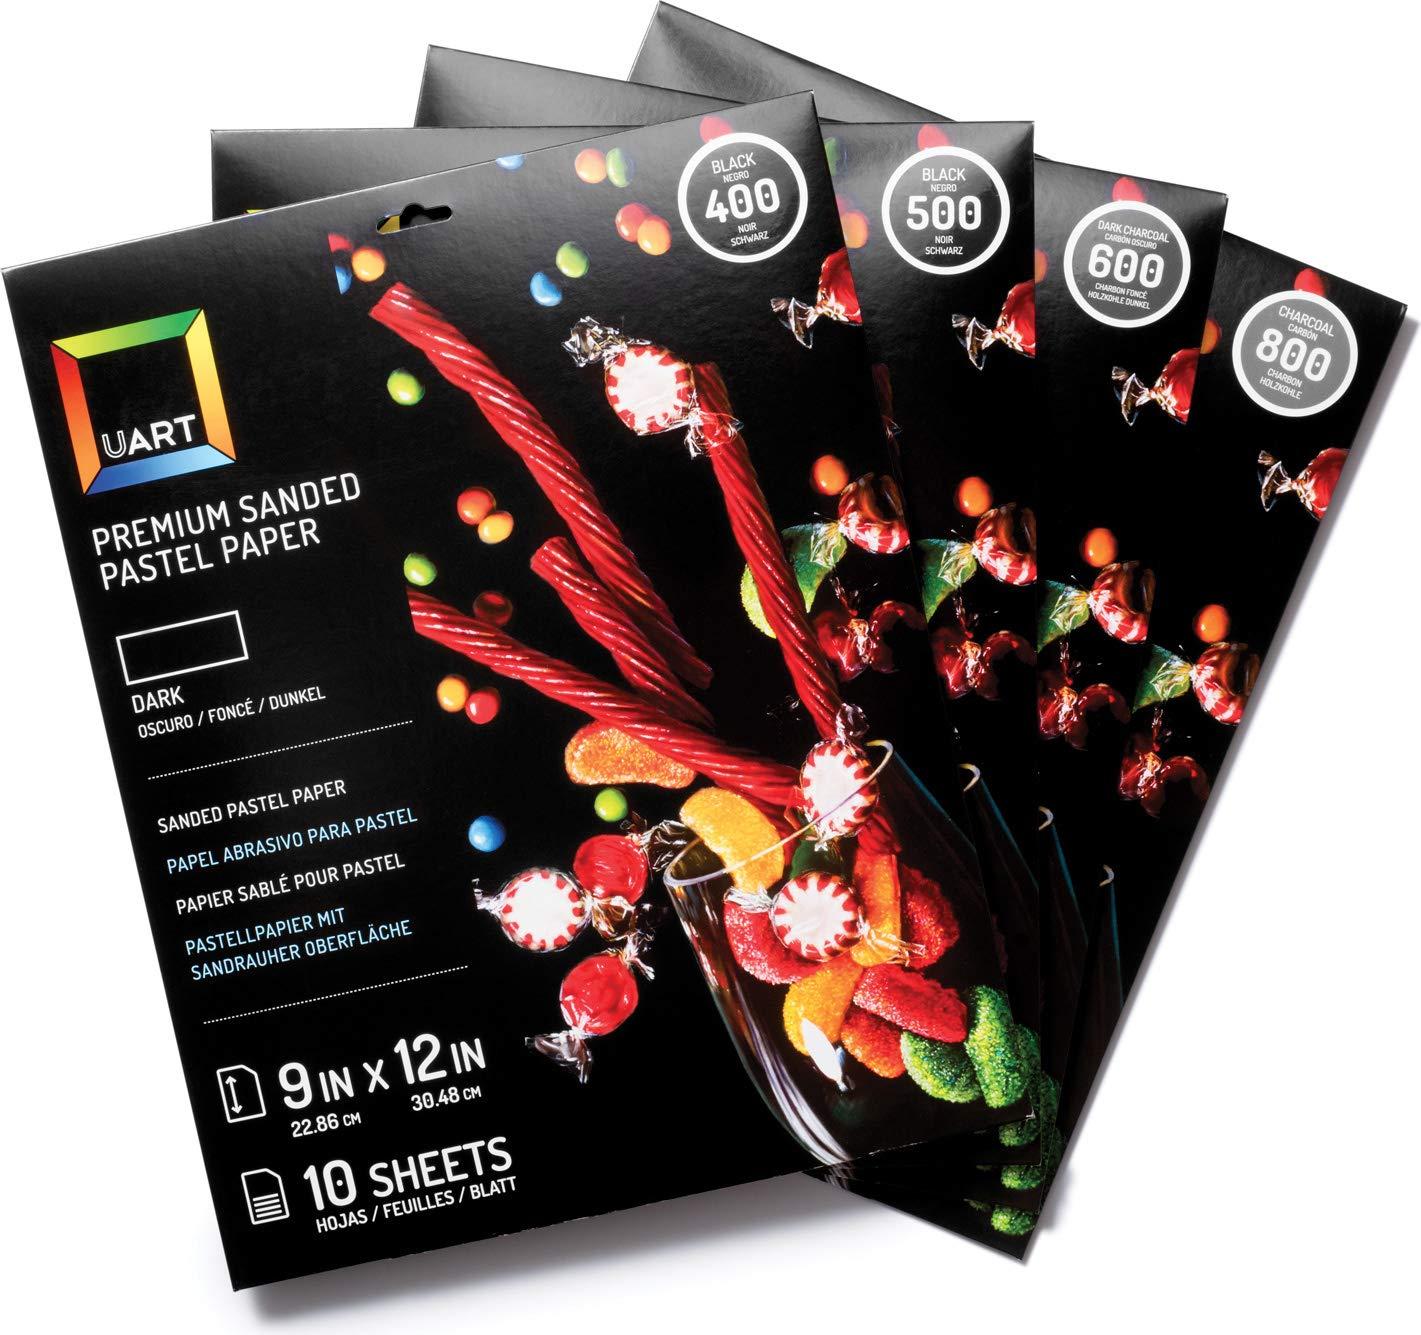 UART Premium Dark Pastel Paper (9    x 12 ) 800 Grade Pad - 10 Sheets B07K7S5LPN | Nicht so teuer  9bbf19